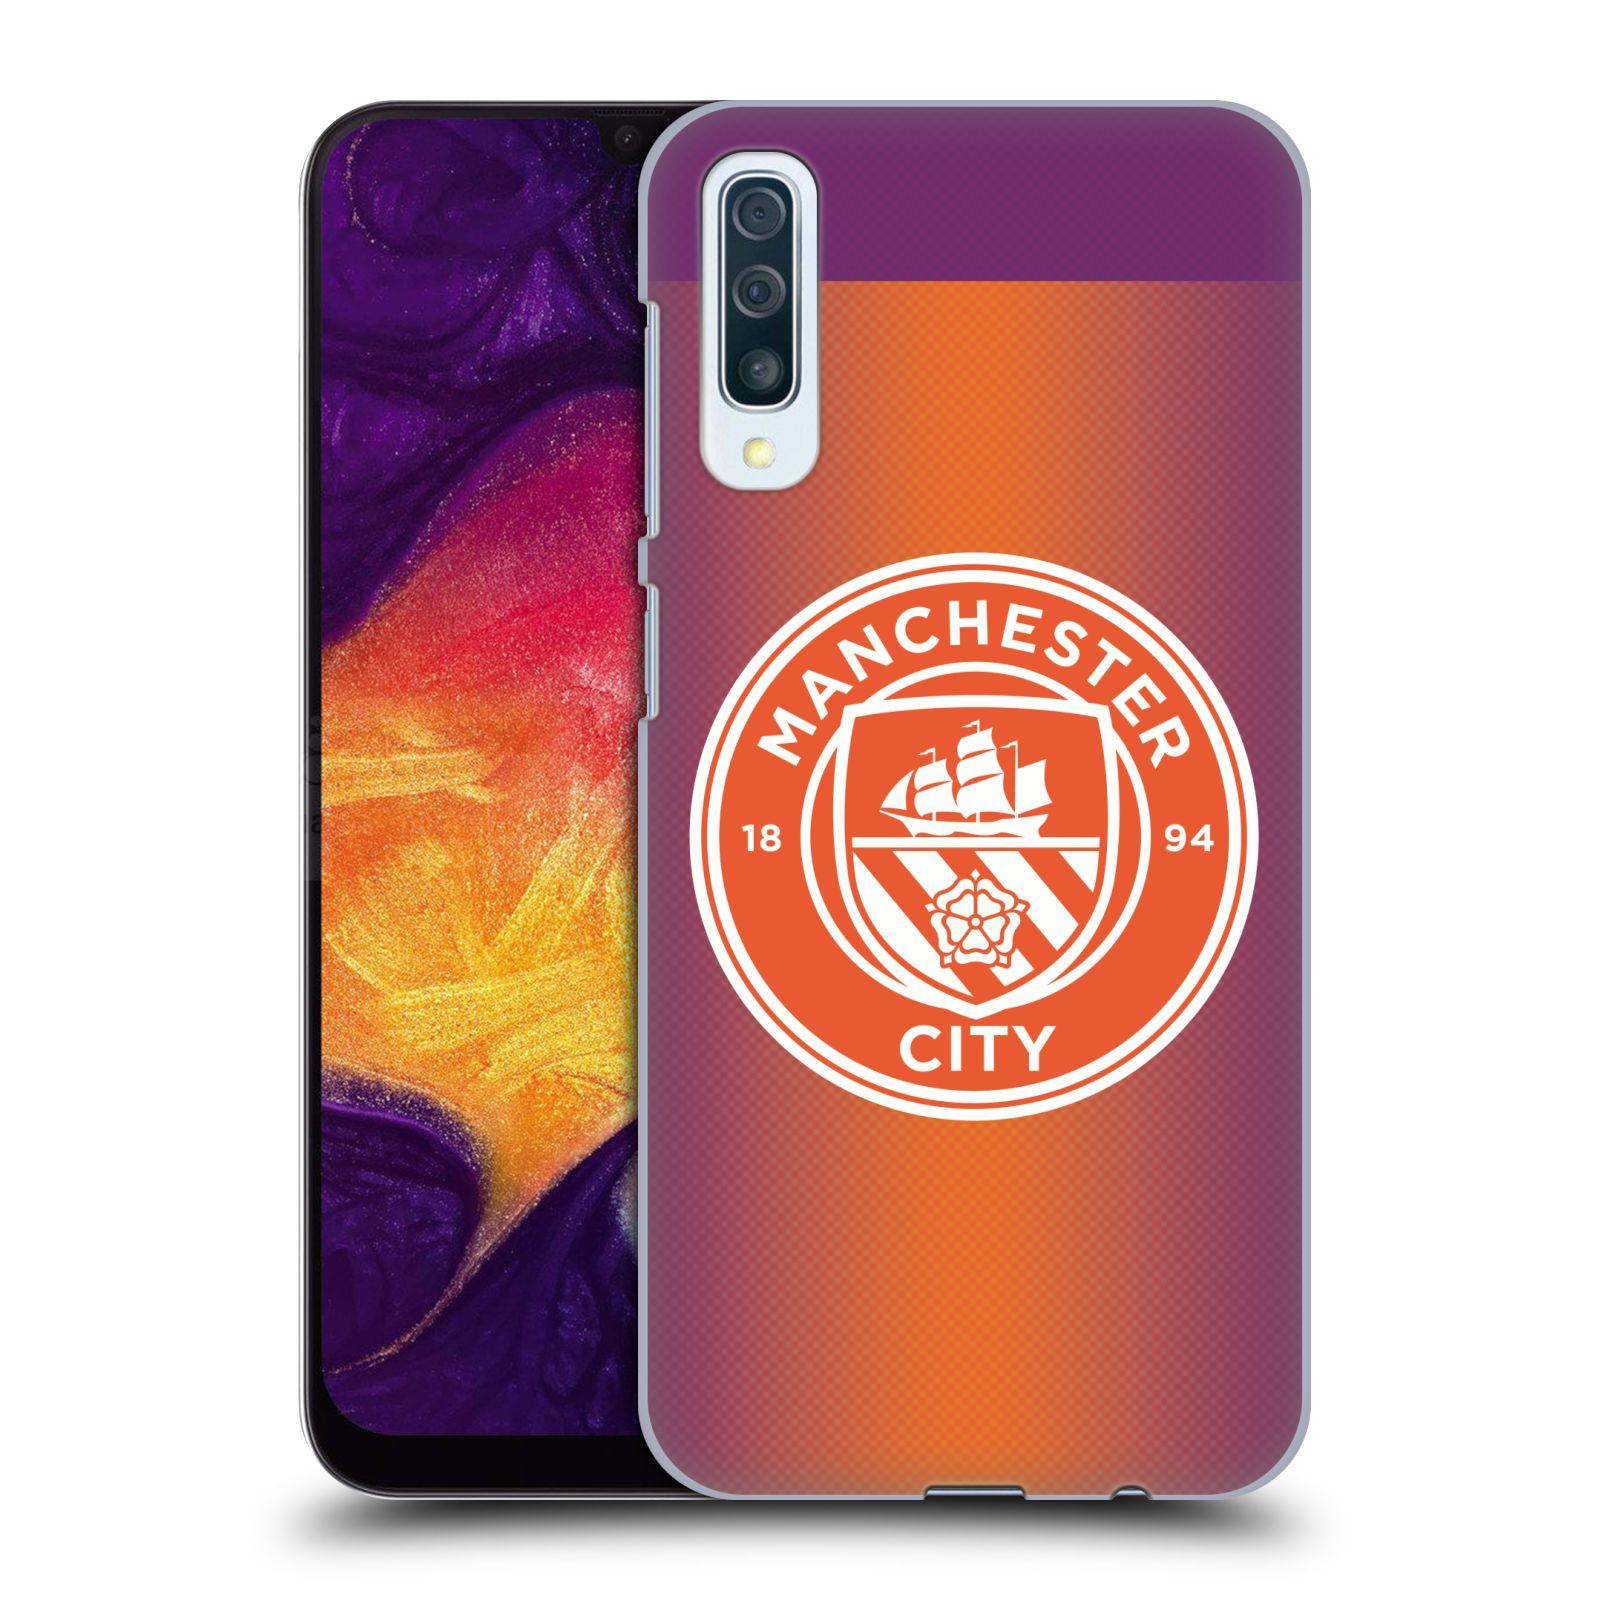 Plastové pouzdro na mobil Samsung Galaxy A50 - Head Case - Manchester City FC - Oranžové nové logo